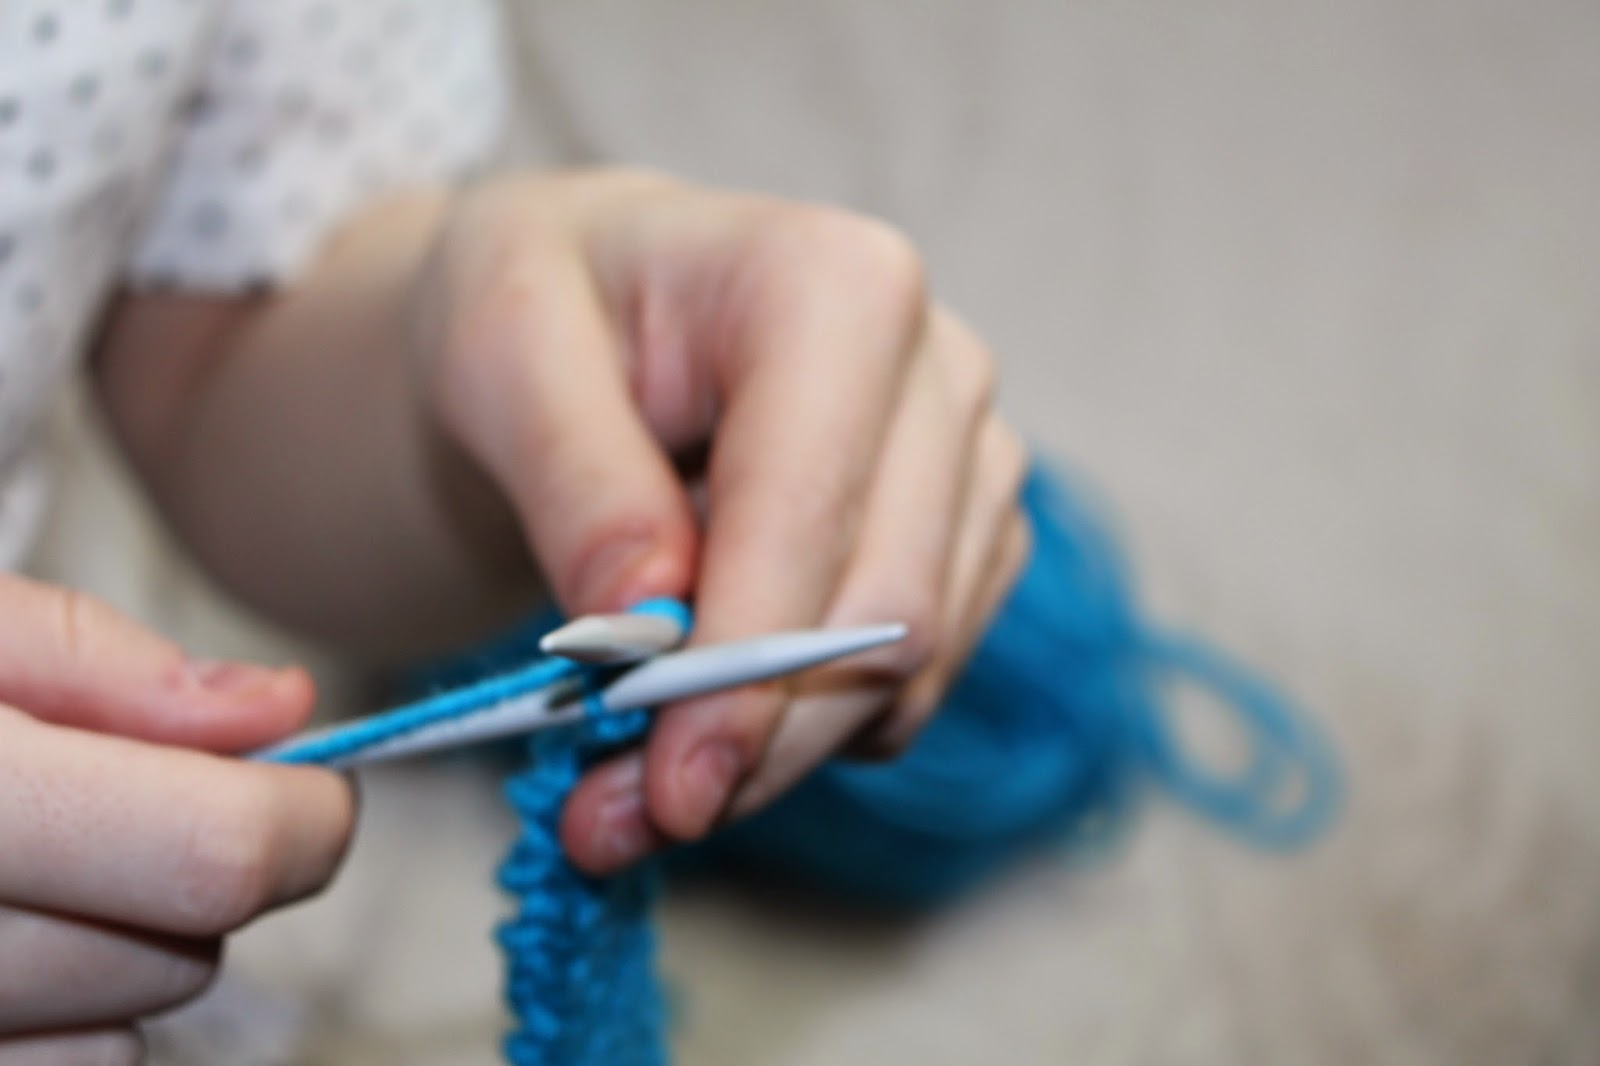 knitting shoutjohn blue